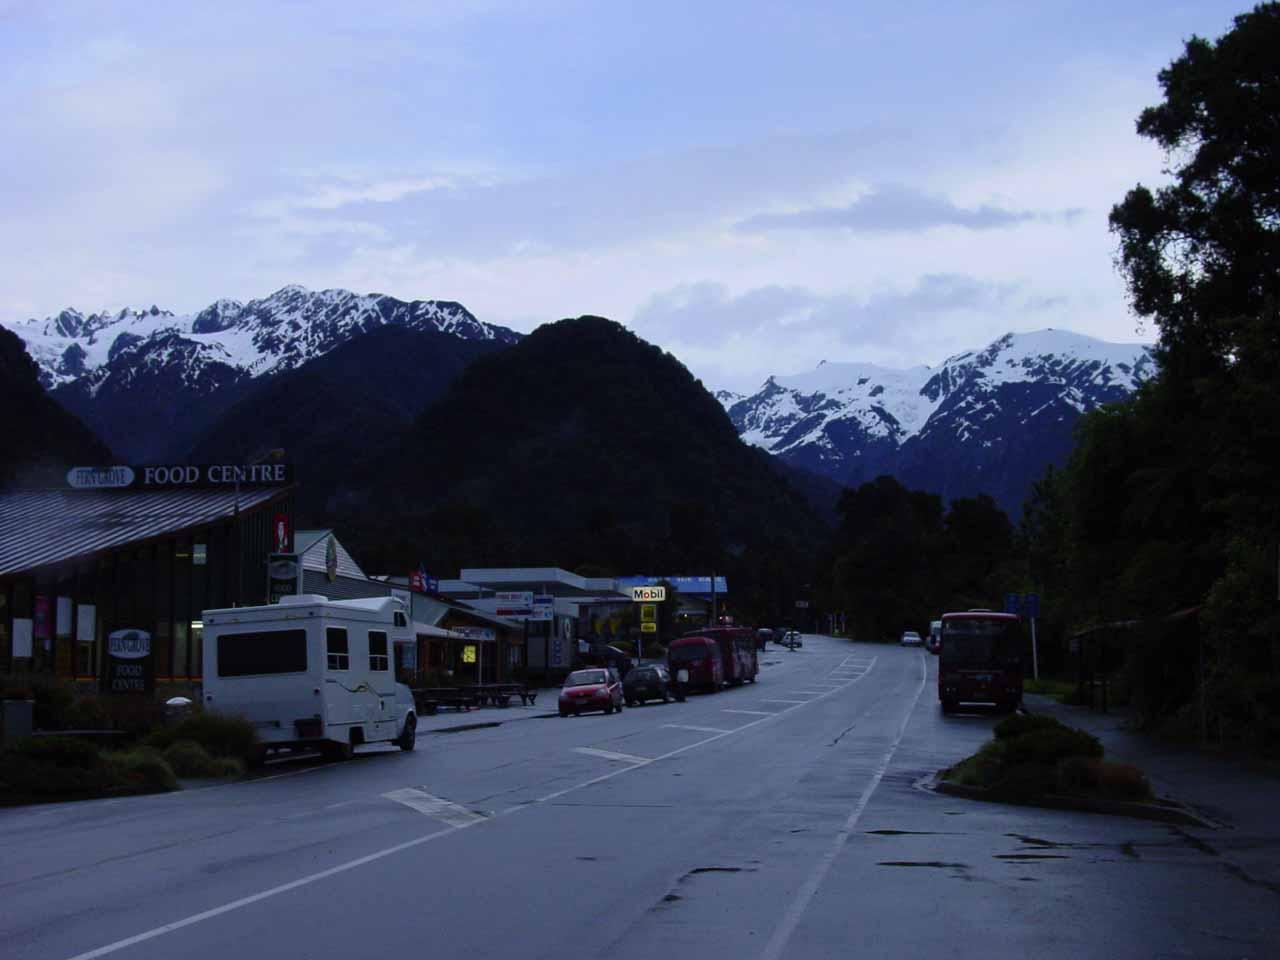 SH6 and the Franz Josef Glacier township